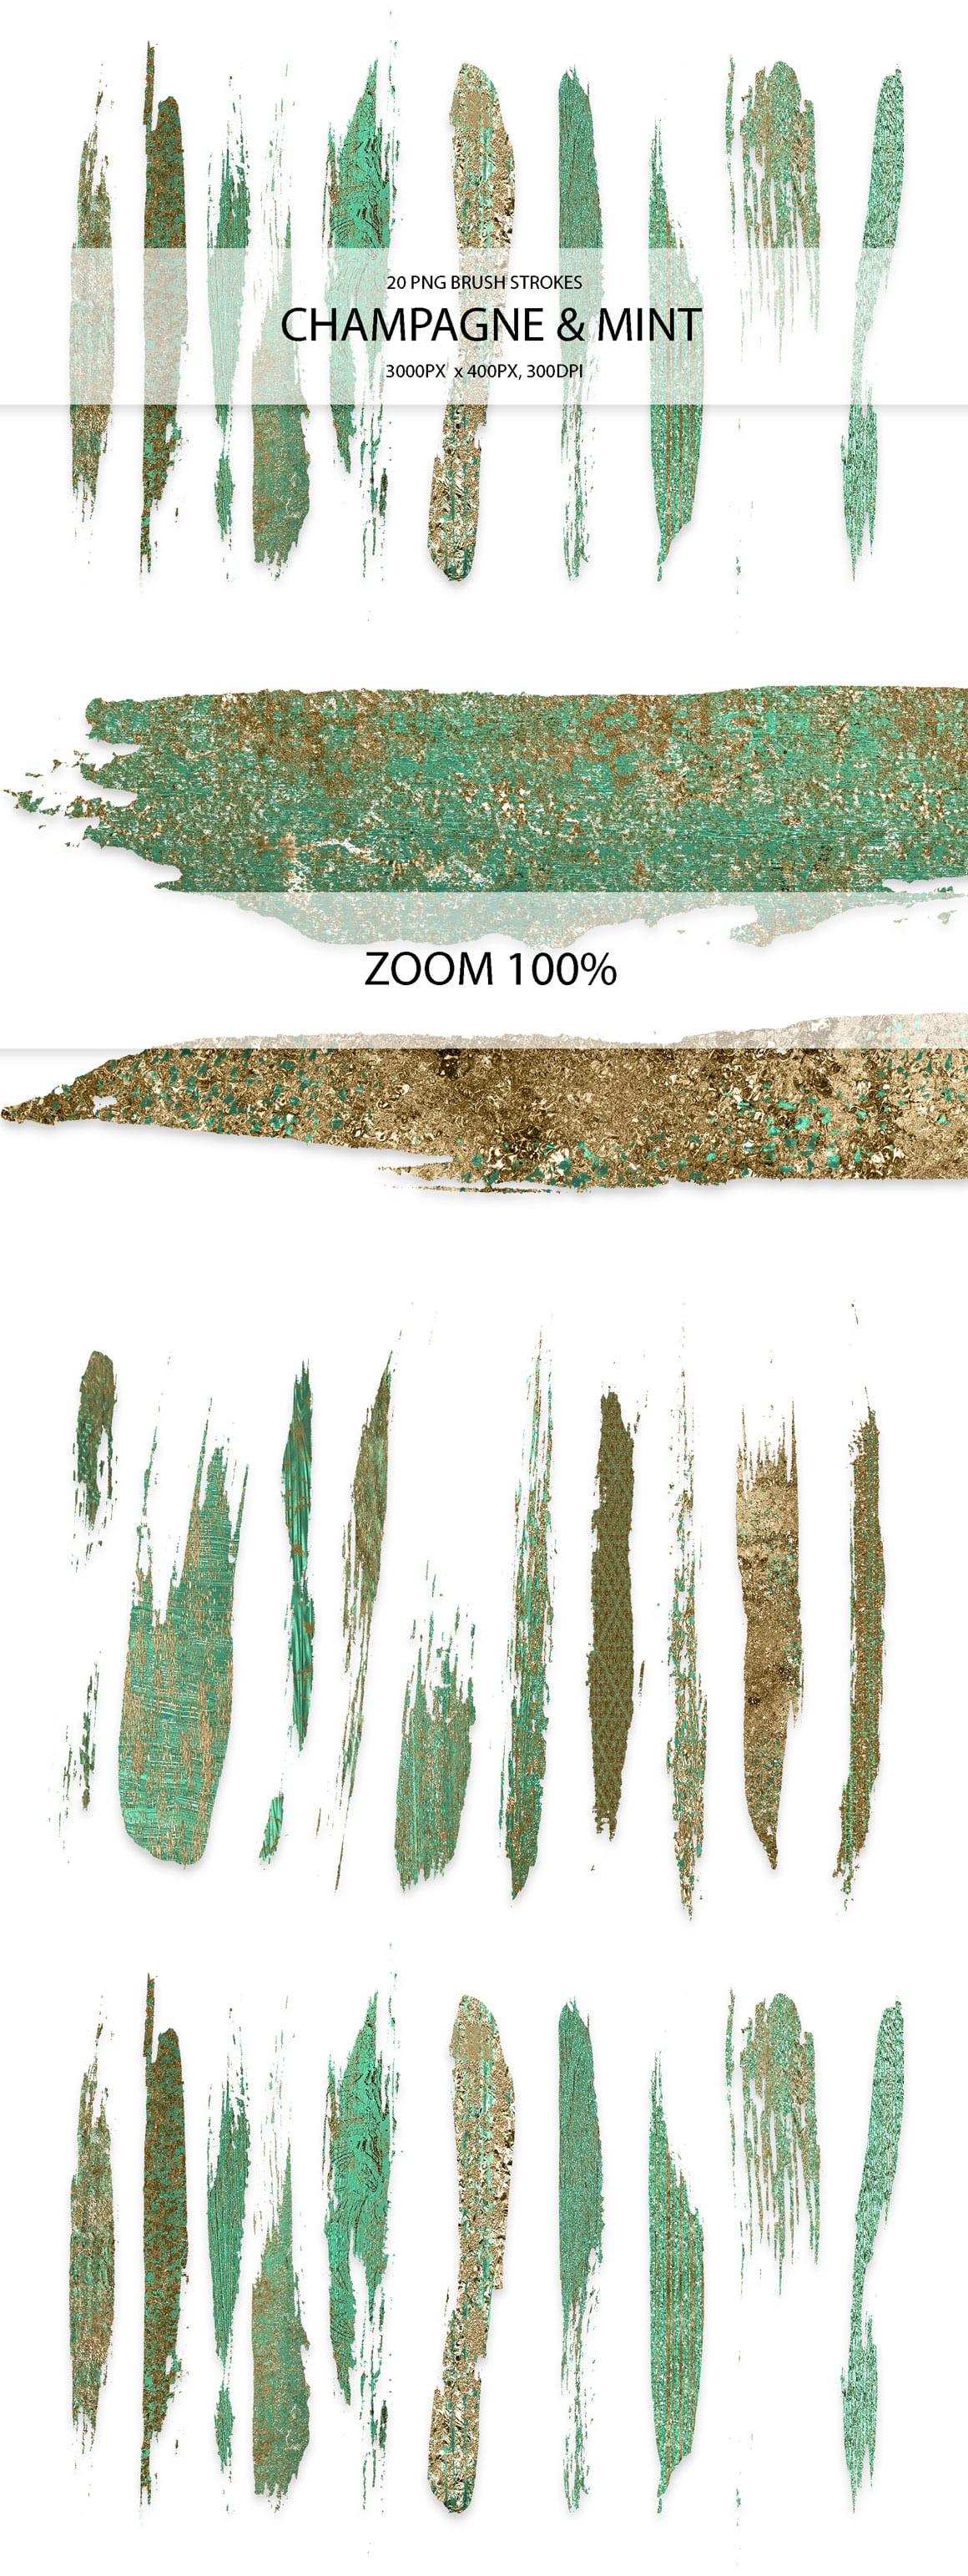 829 Acrylic Brush Strokes and Digital Brush Strokes - $9 - ChampagneMintStrokes 01 min